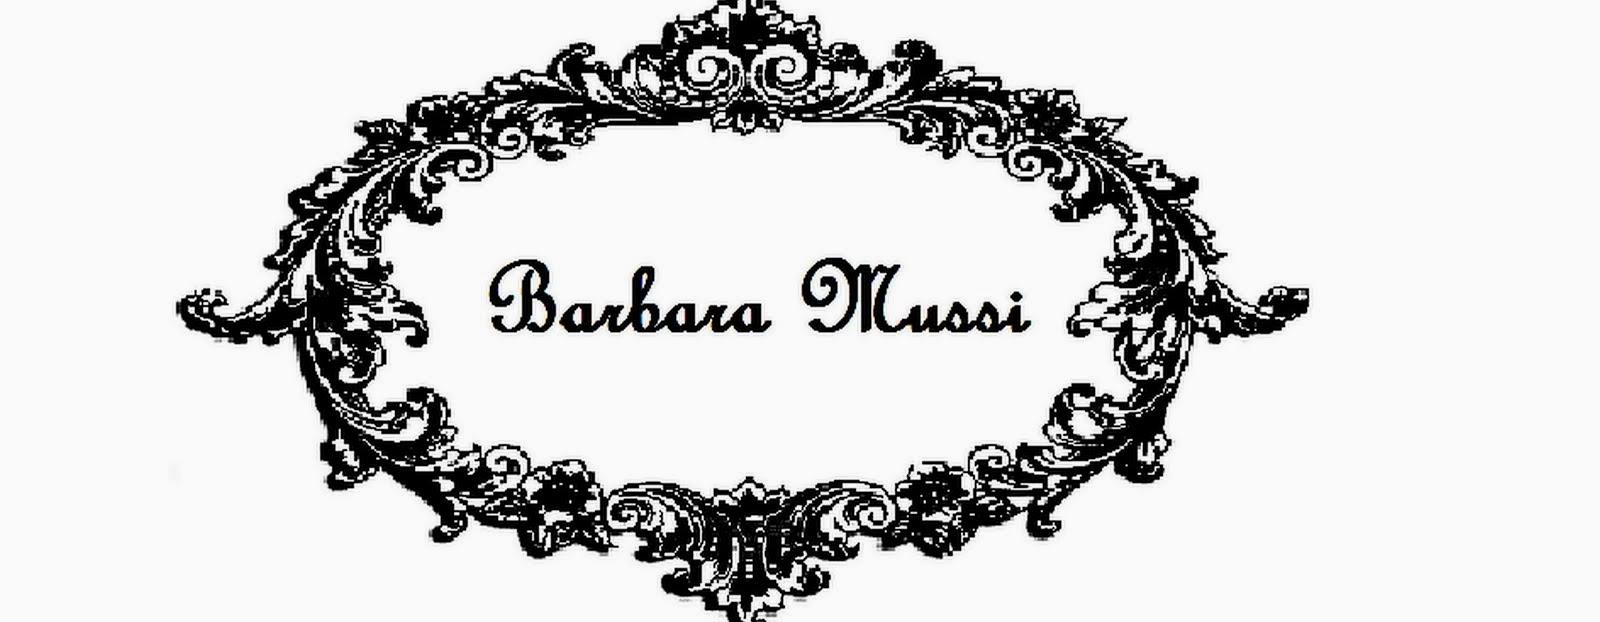 Barbara Mussi